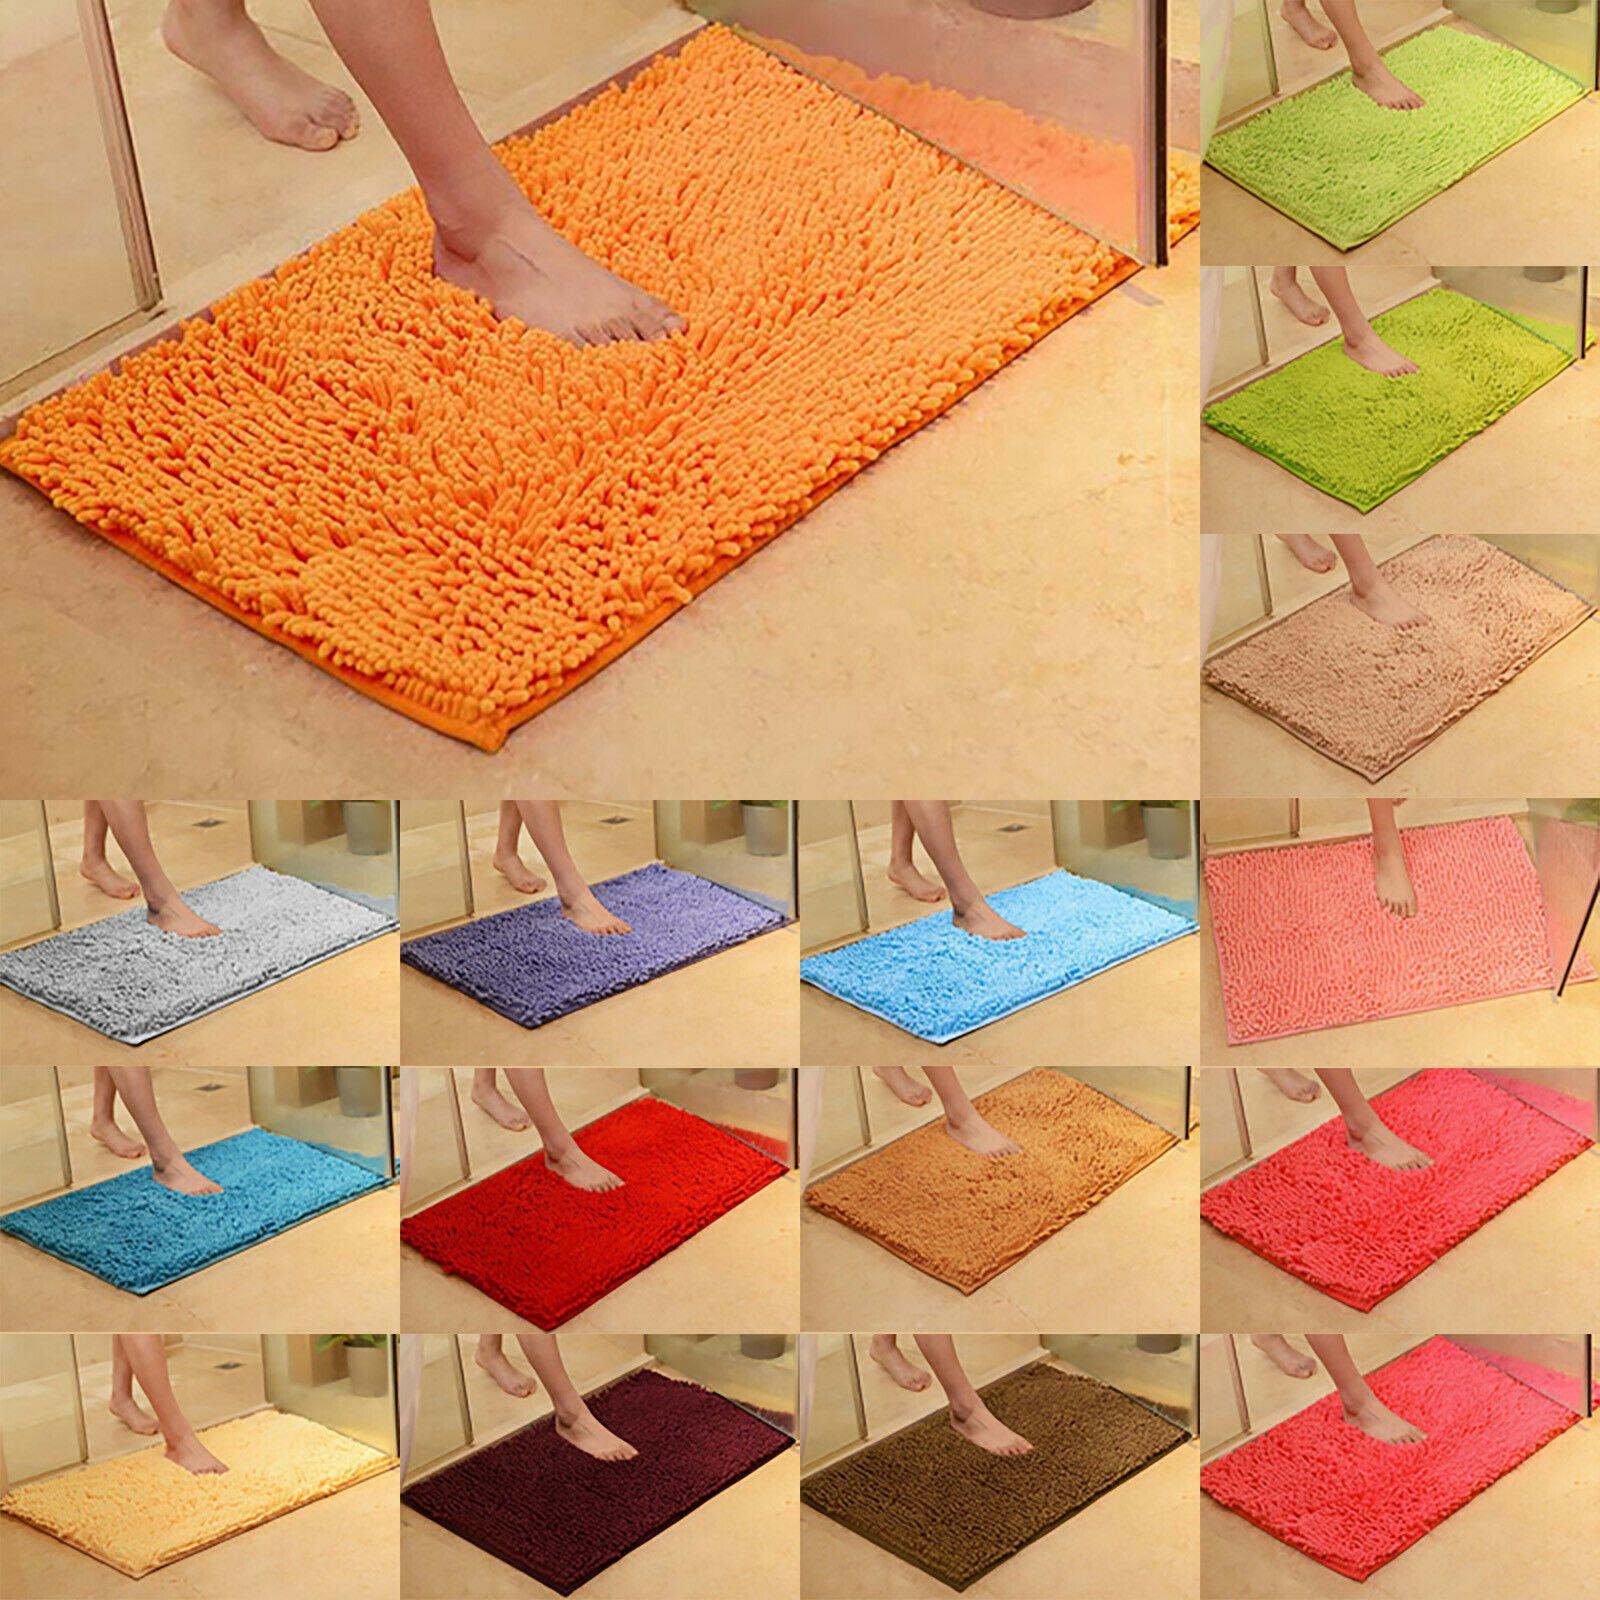 Soft Microfibre Shaggy Non Slip Absorbent Bath Mat Bathroom Shower Rugs Carpet